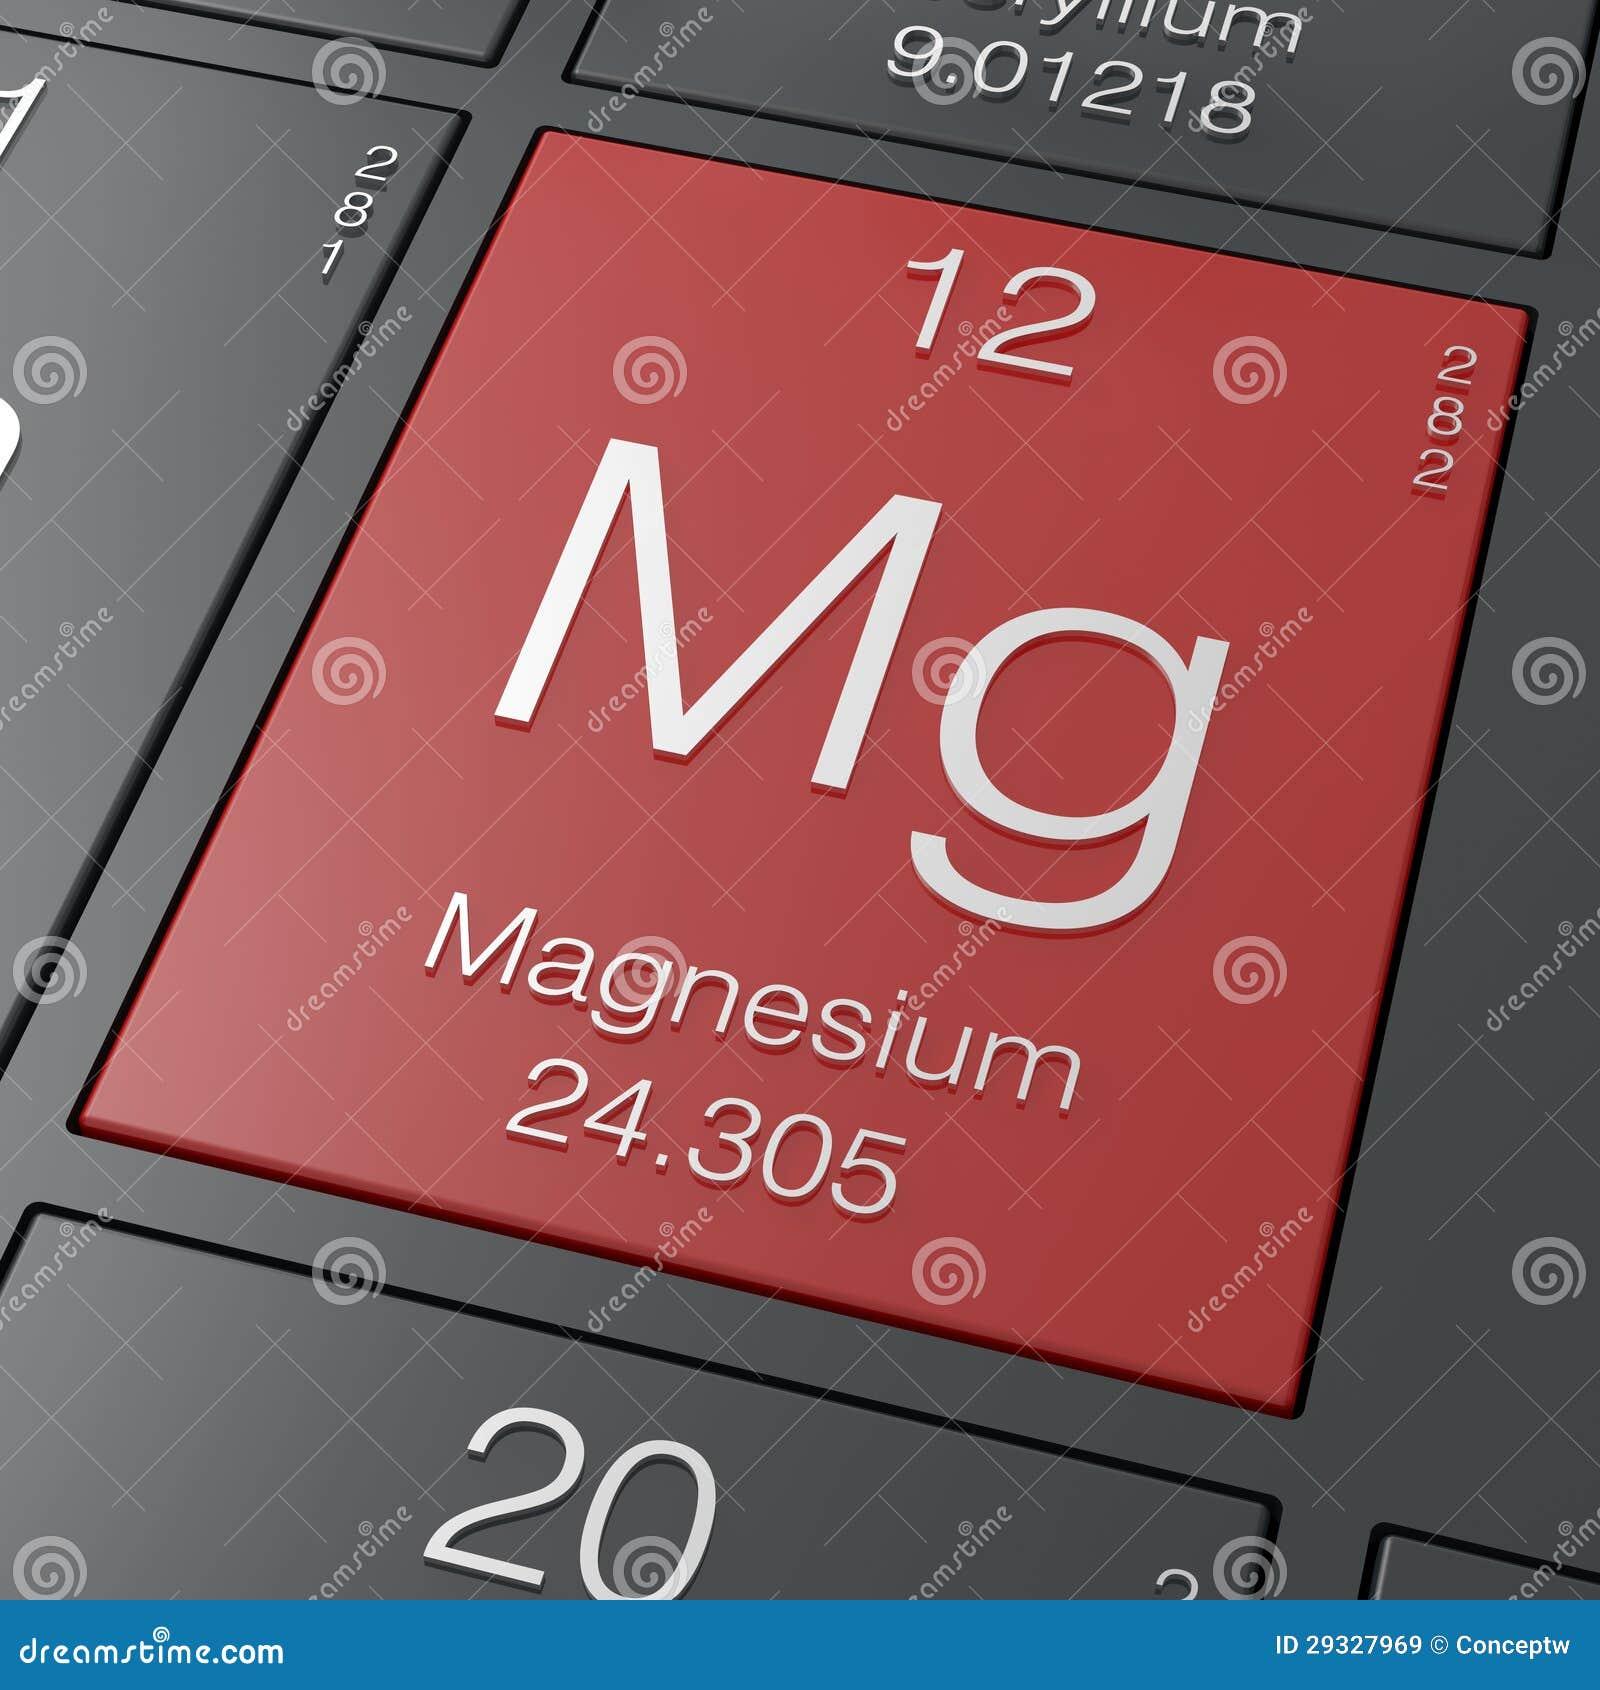 Diabetes And Magnesium